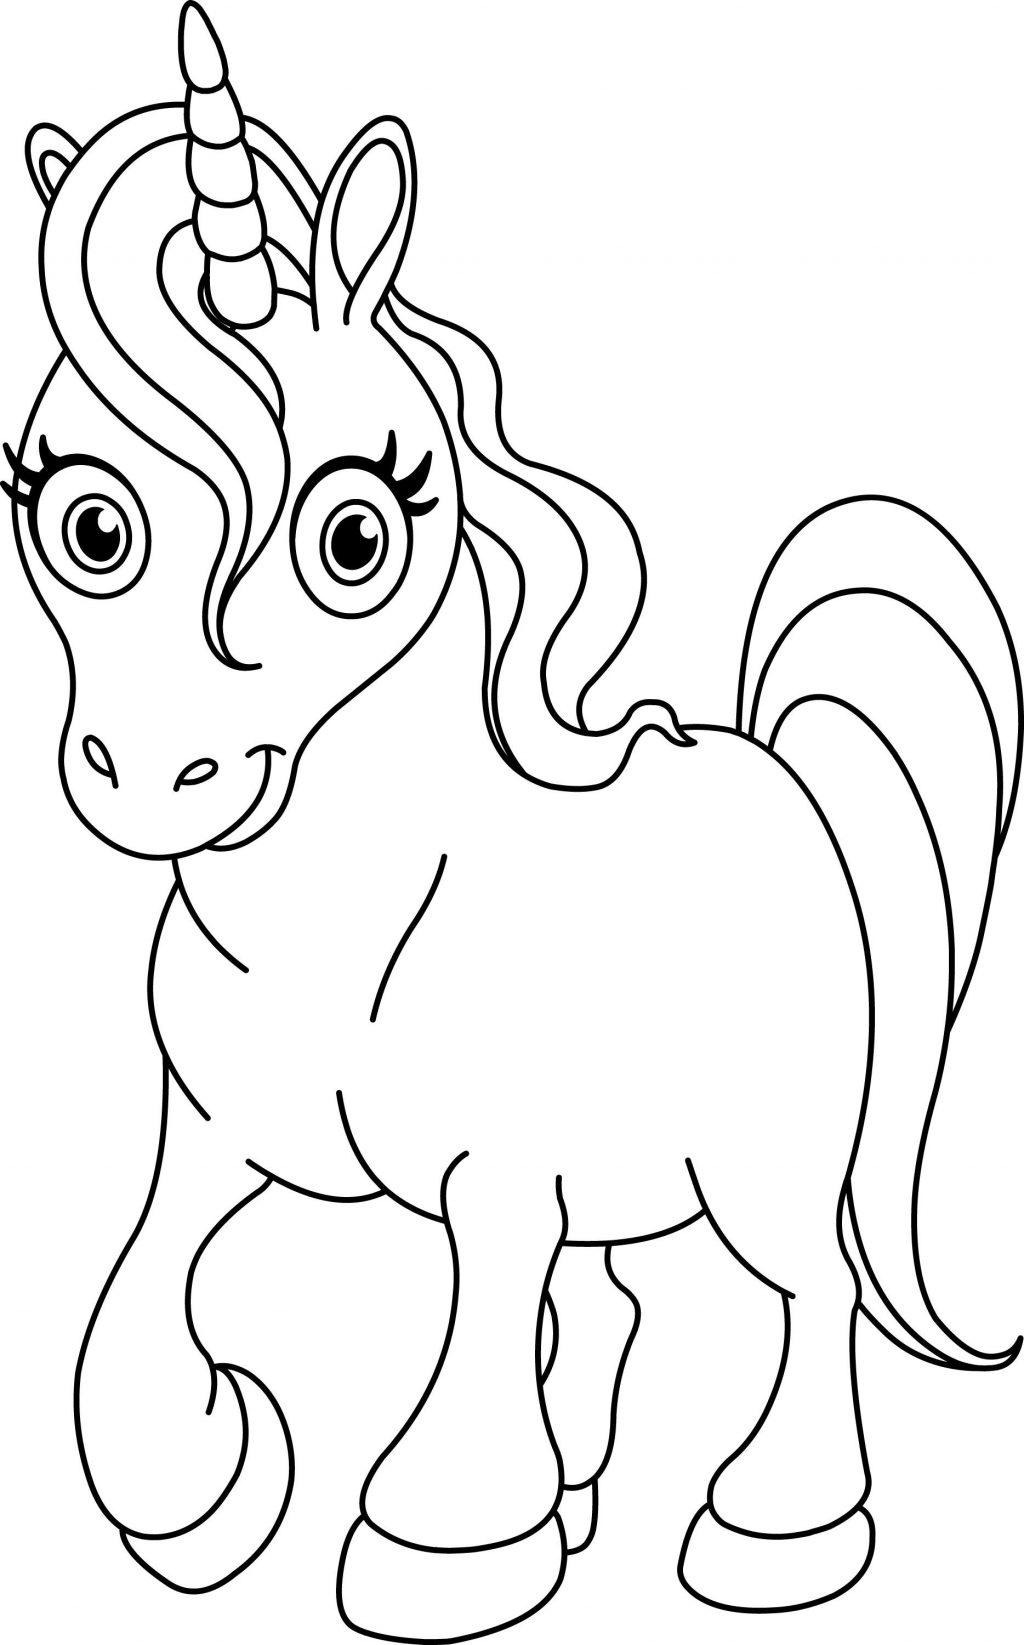 Coloring Ideas : Coloring Ideas Tremendous Free Printable Unicorn - Free Printable Unicorn Coloring Pages